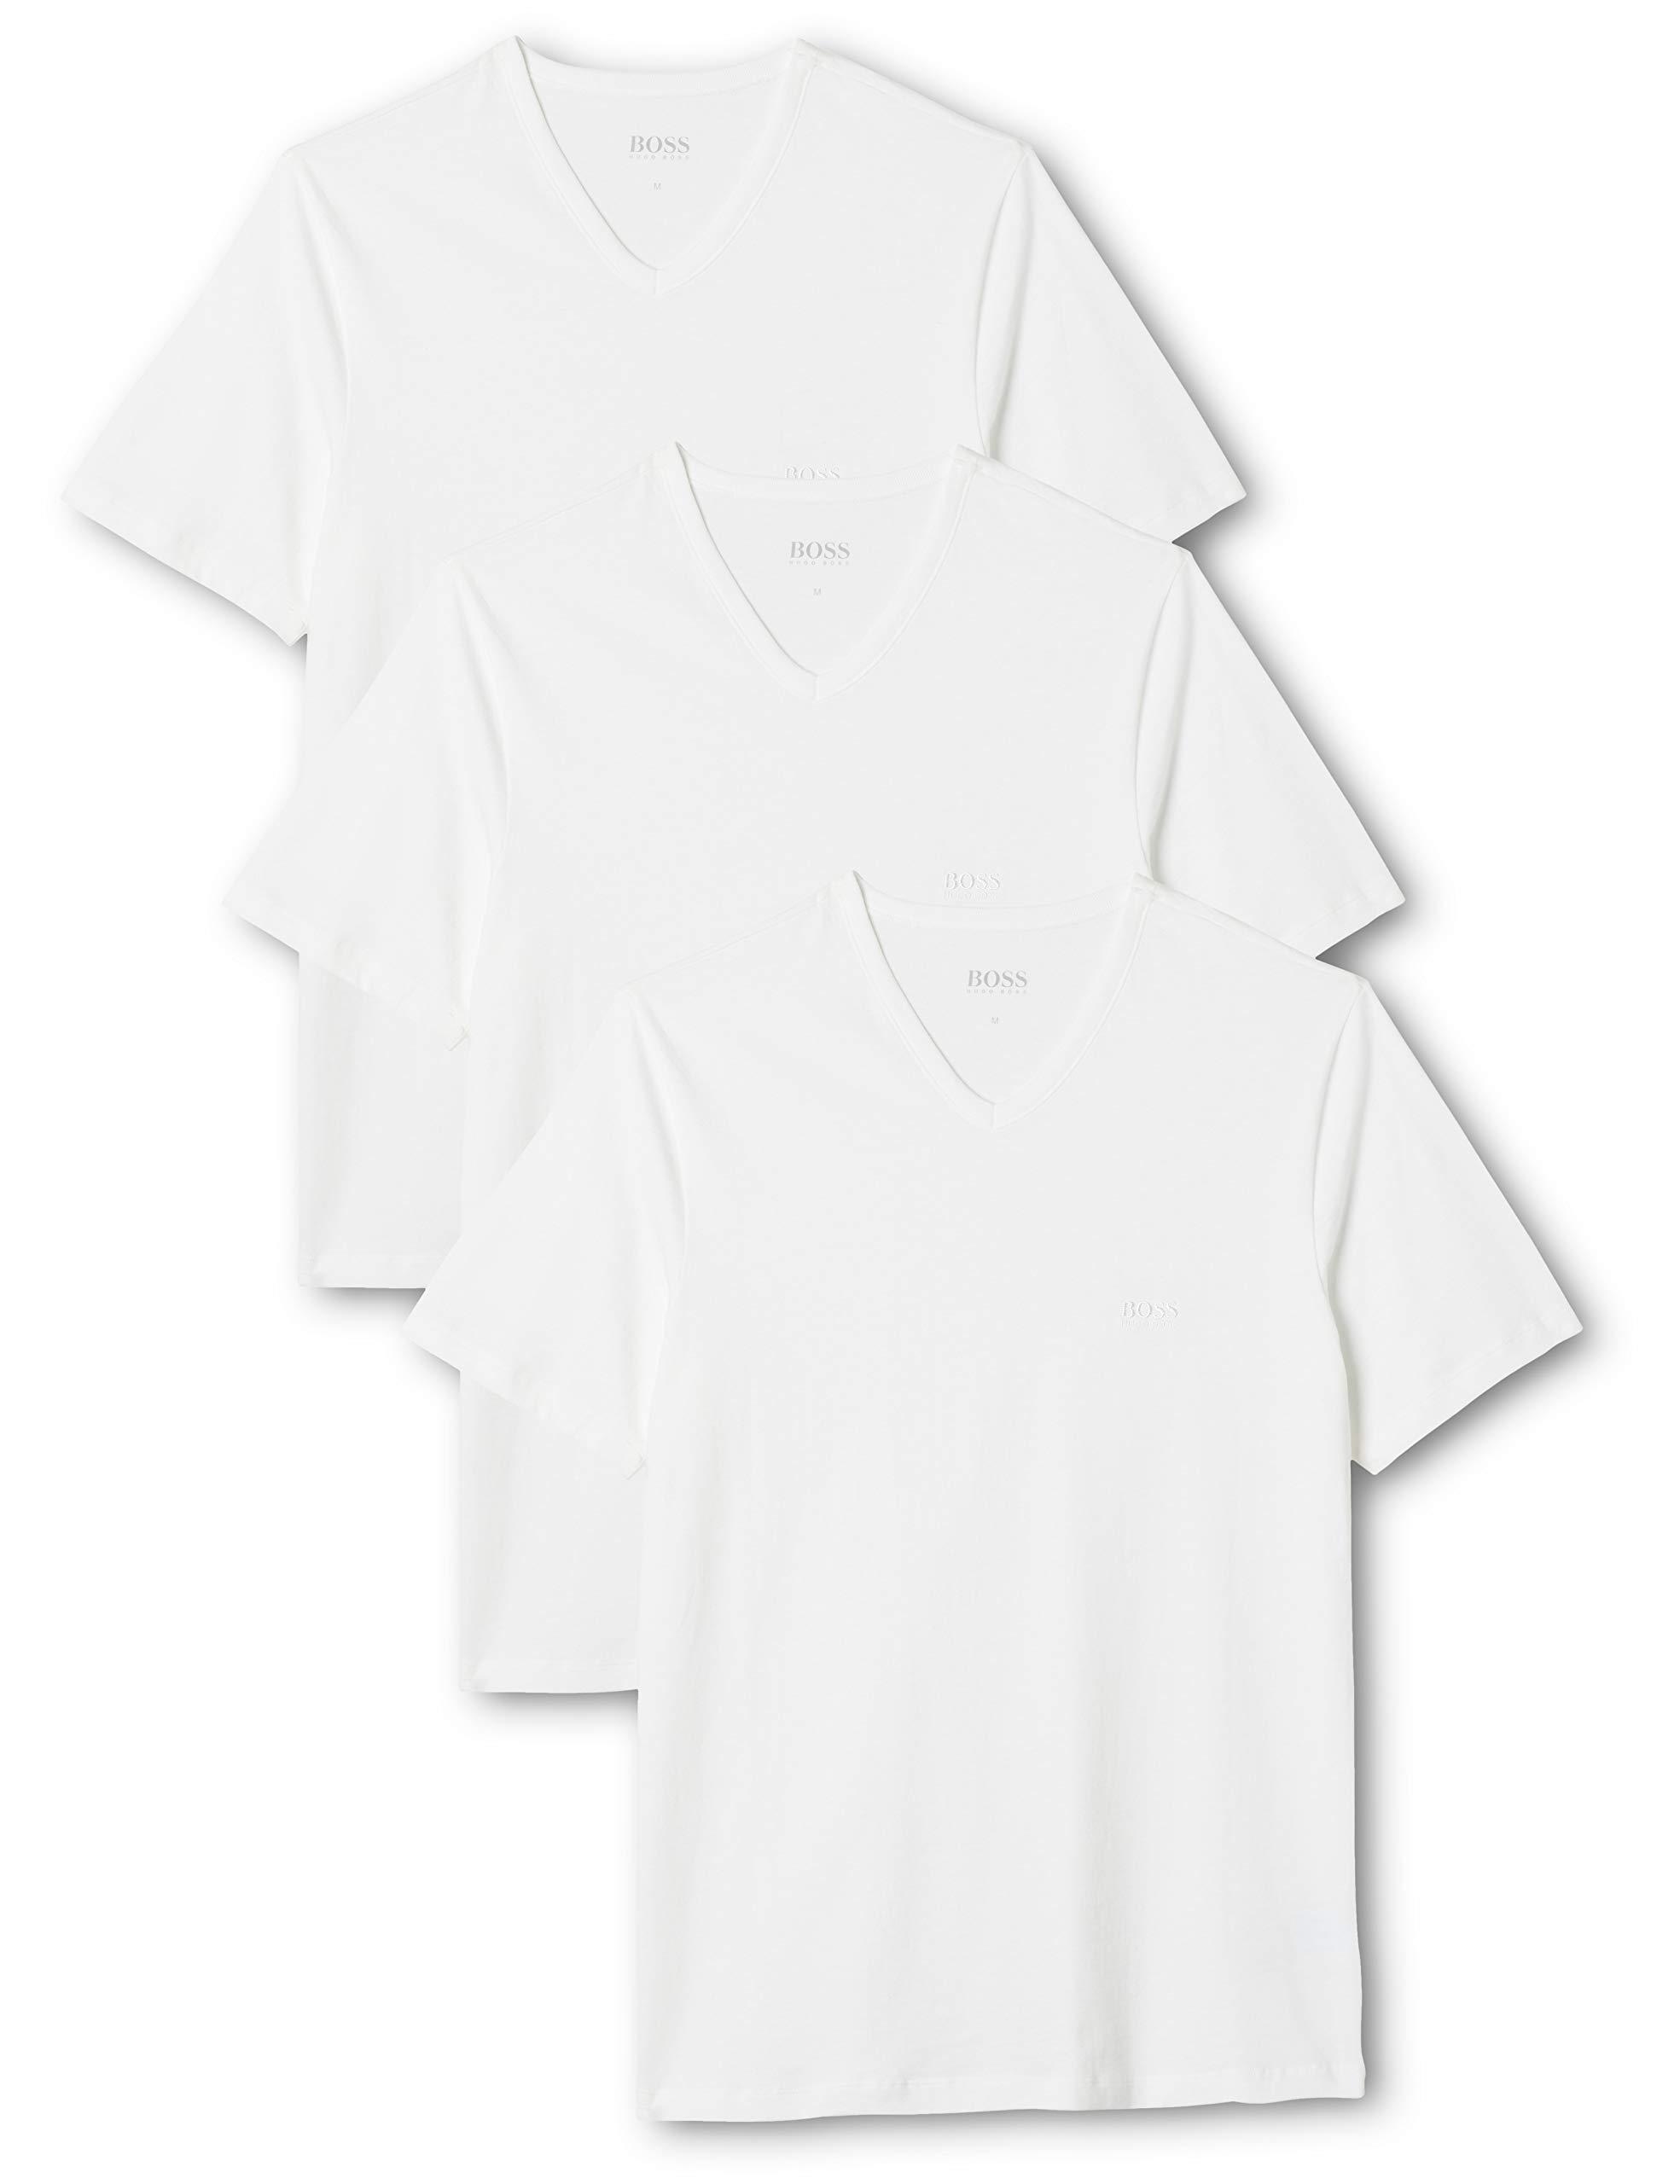 b3717da5d40a R Klick Mich Männer Premium T Shirt   Forge of Empires